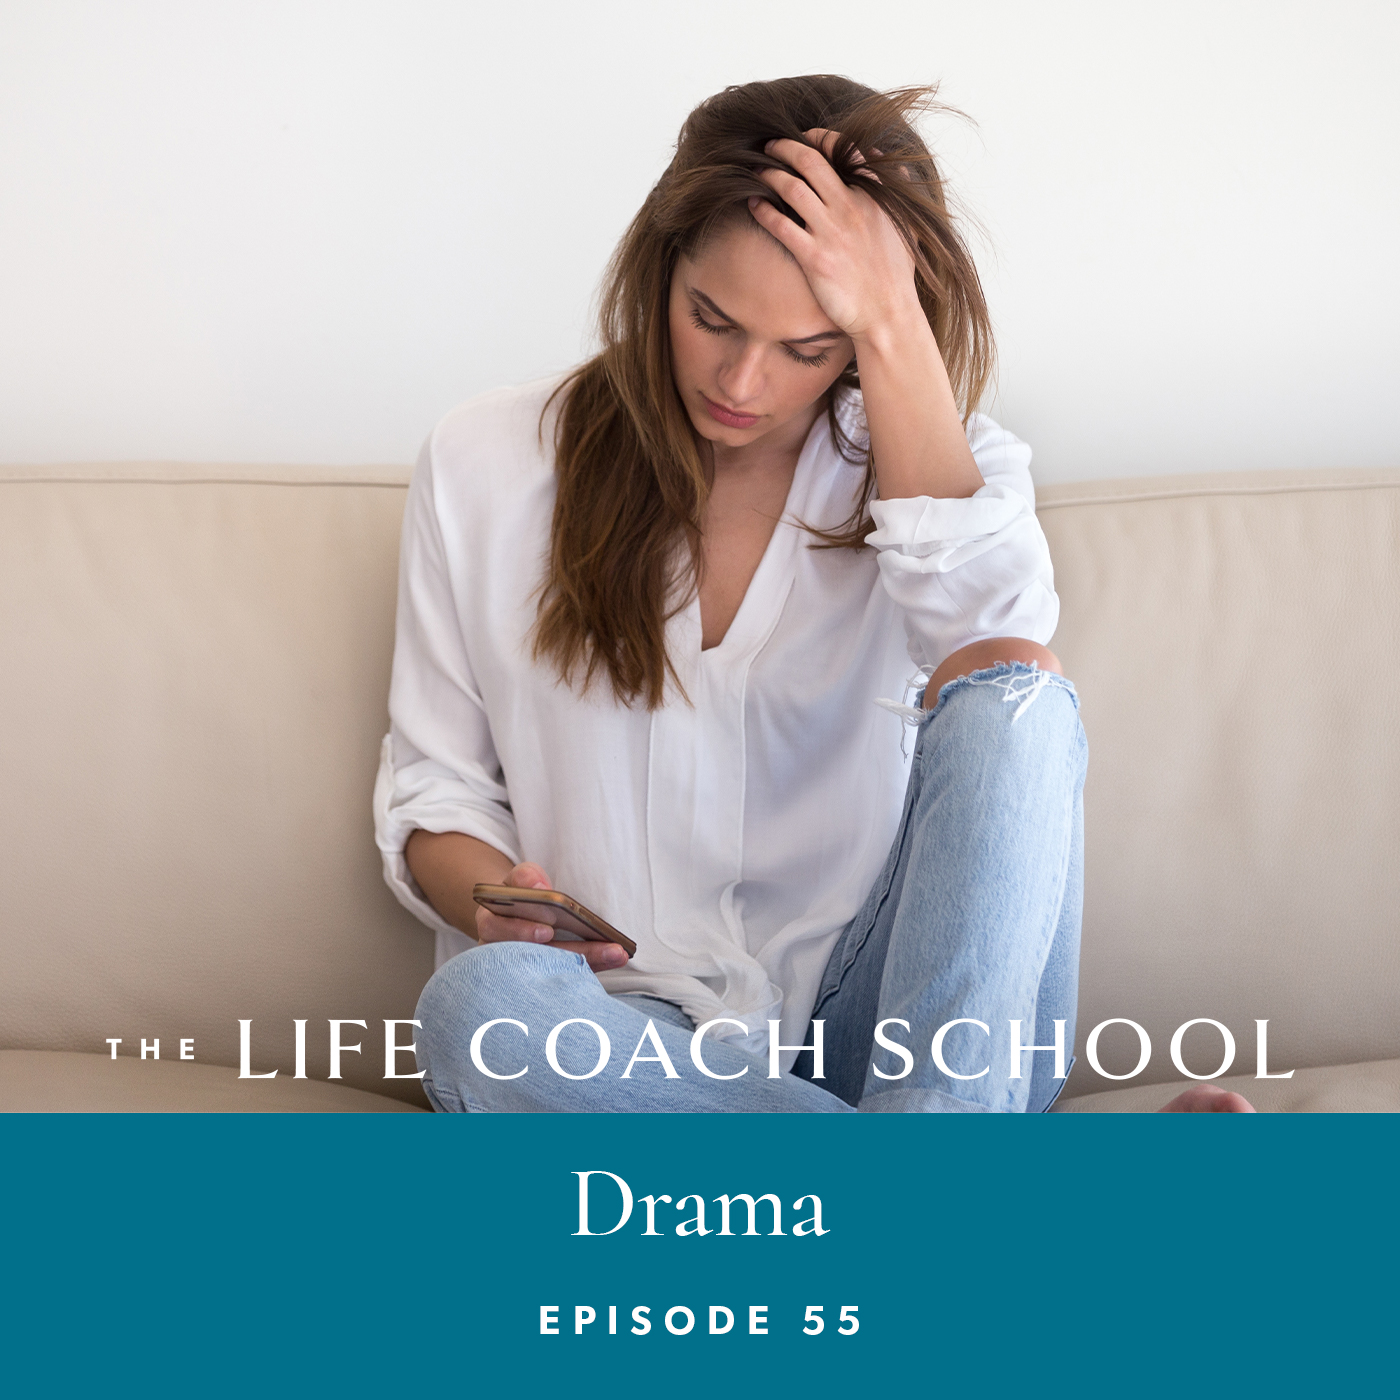 The Life Coach School Podcast with Brooke Castillo   Episode 55   Drama